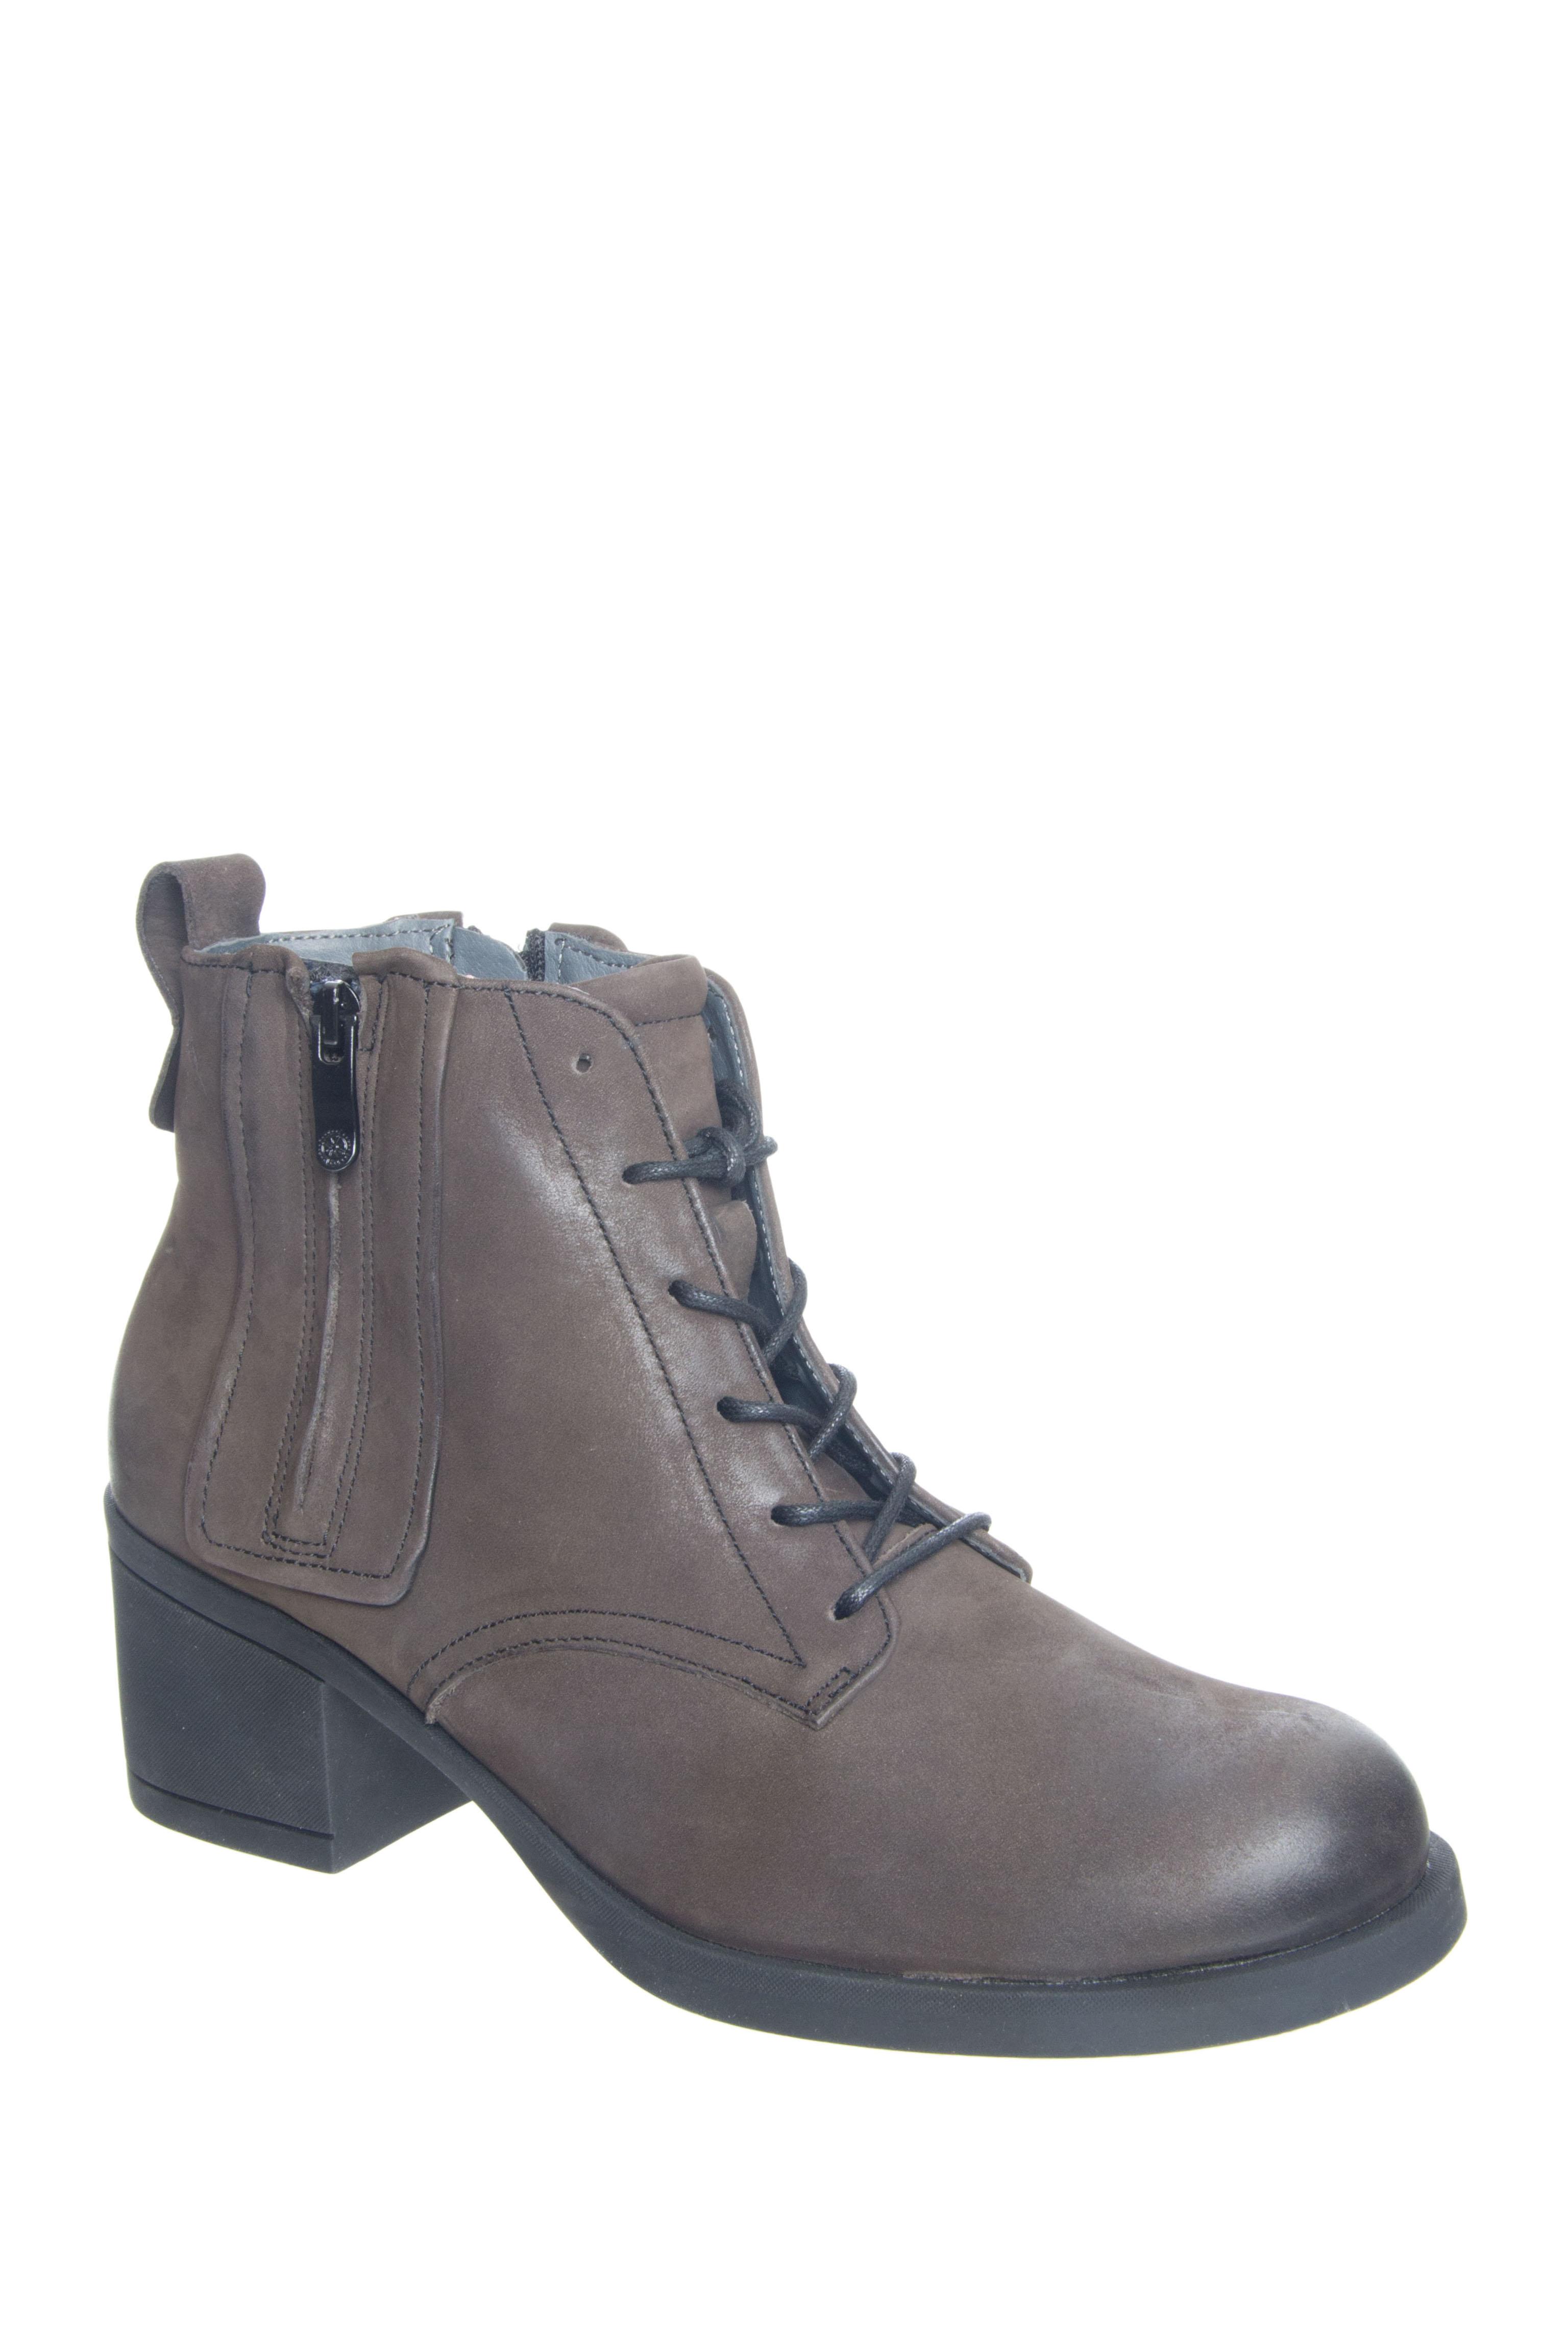 Bussola Teddy Mid Heel Booties - Iron